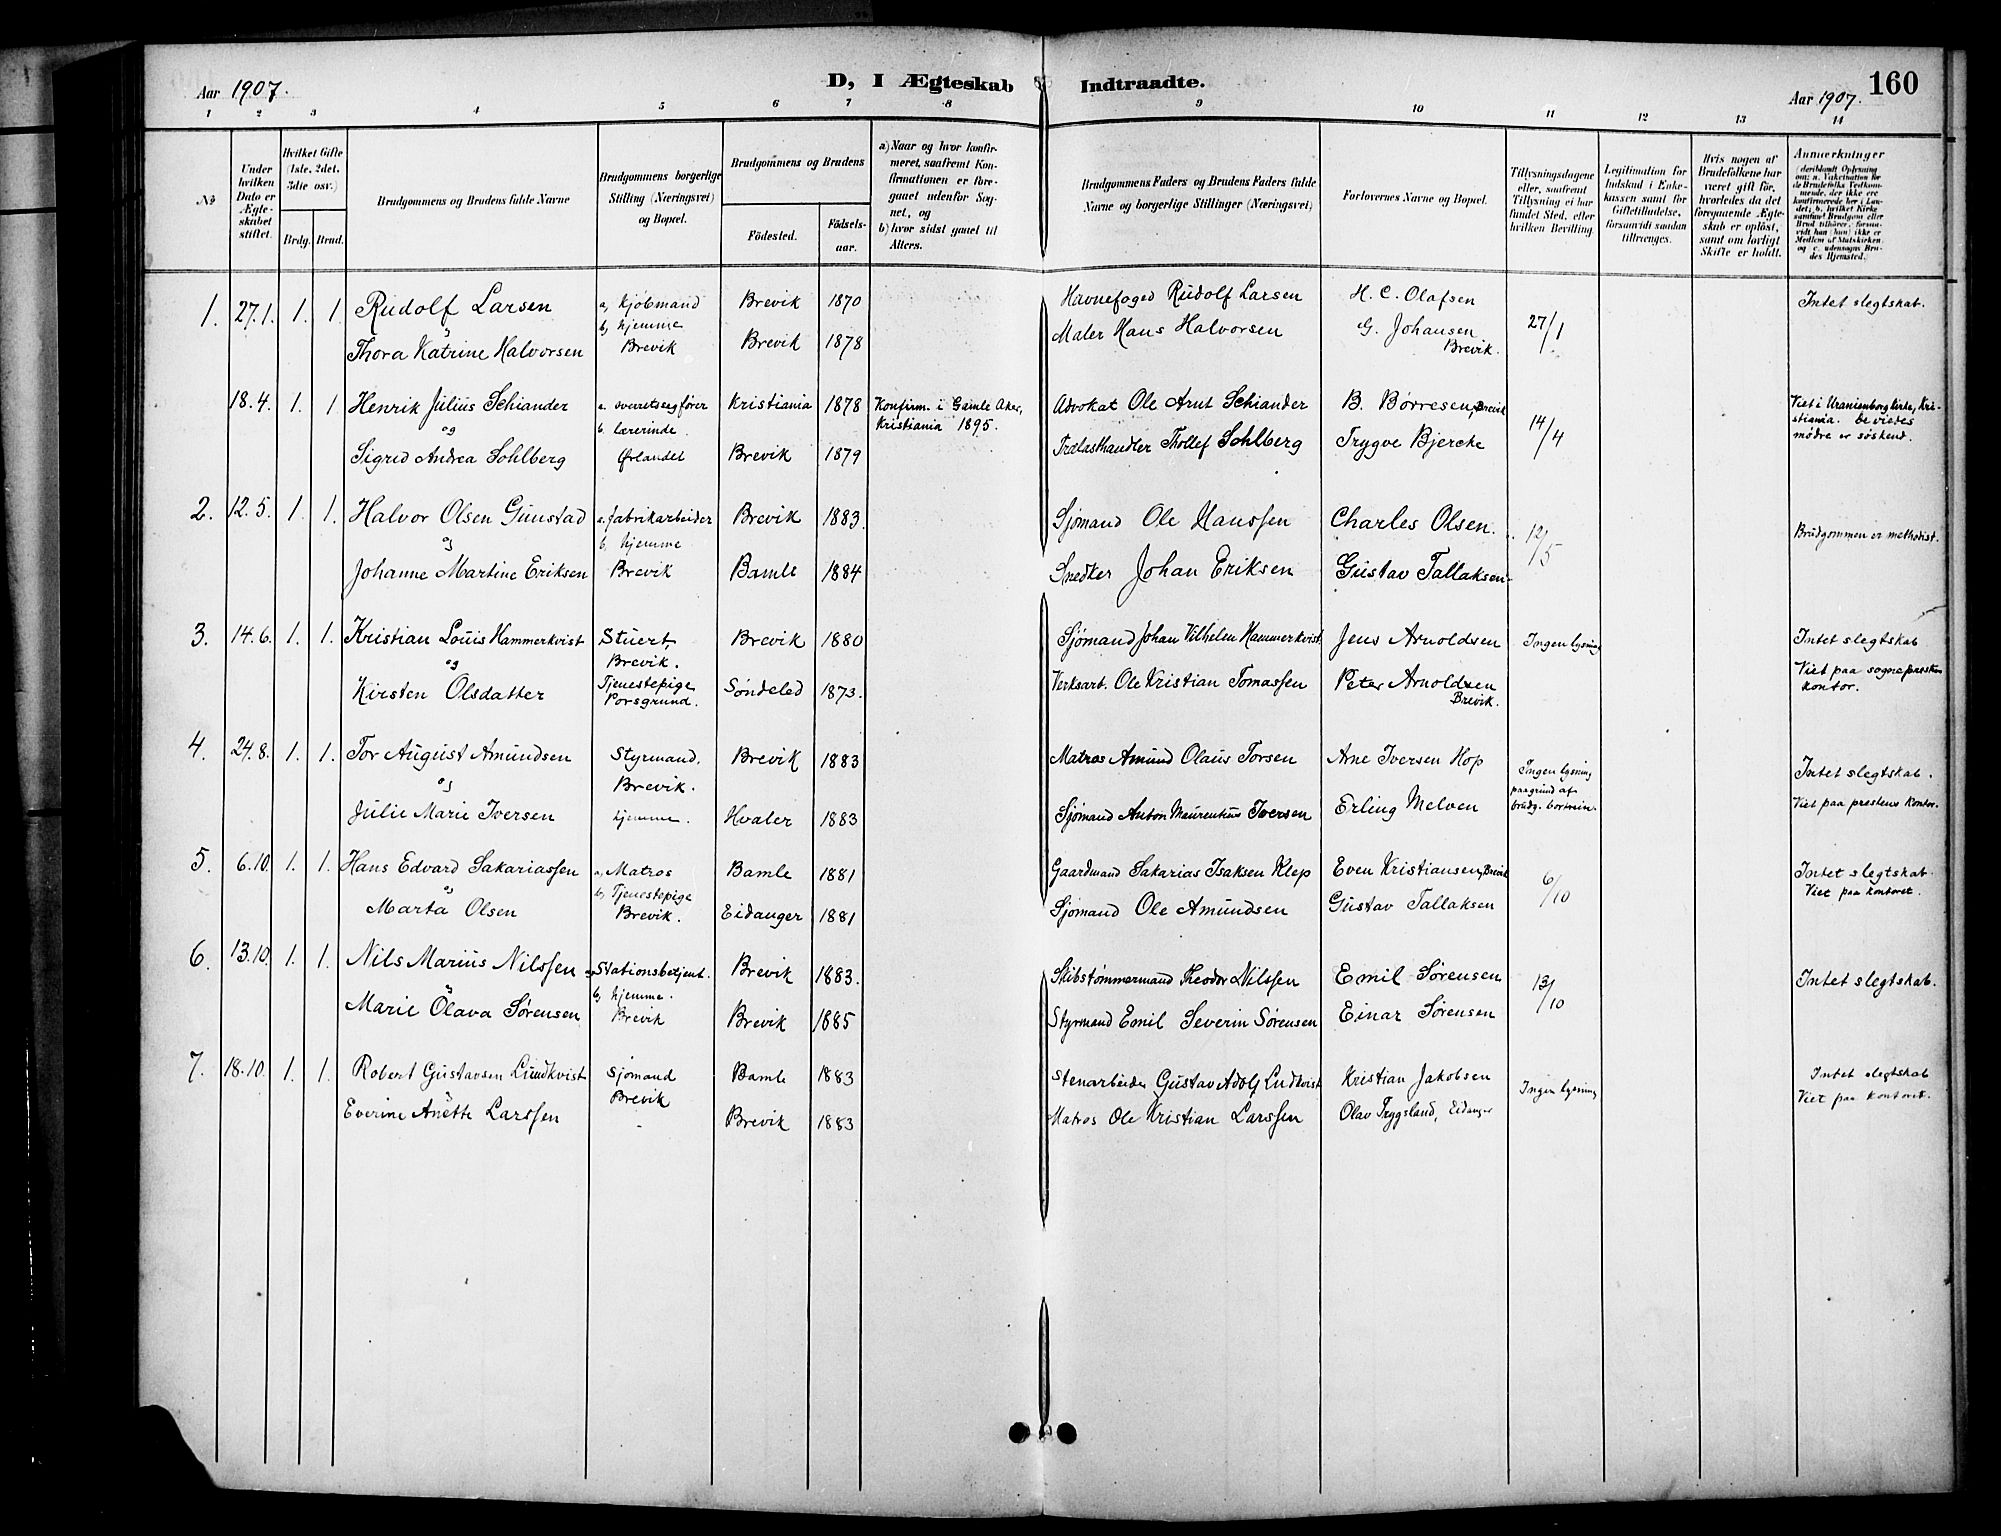 SAKO, Brevik kirkebøker, G/Ga/L0005: Klokkerbok nr. 5, 1901-1924, s. 160